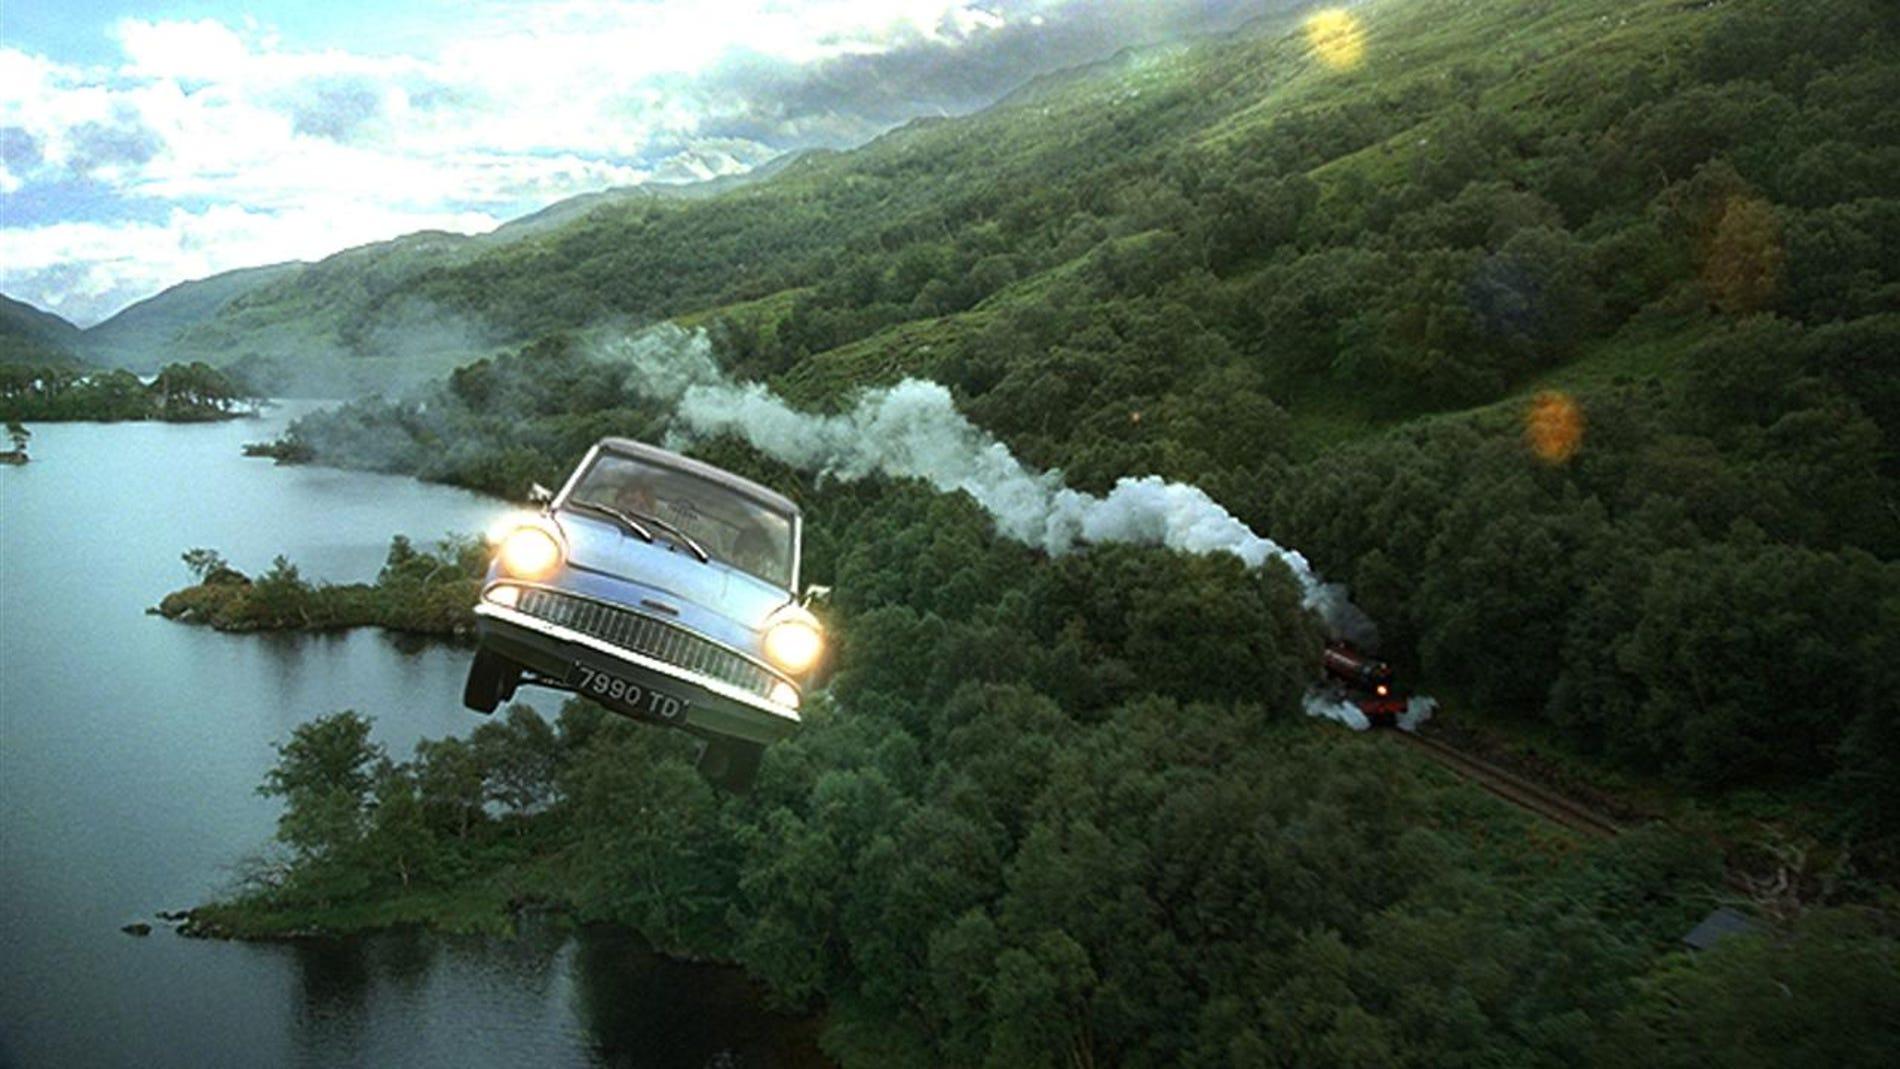 Coche volador de Harry Potter